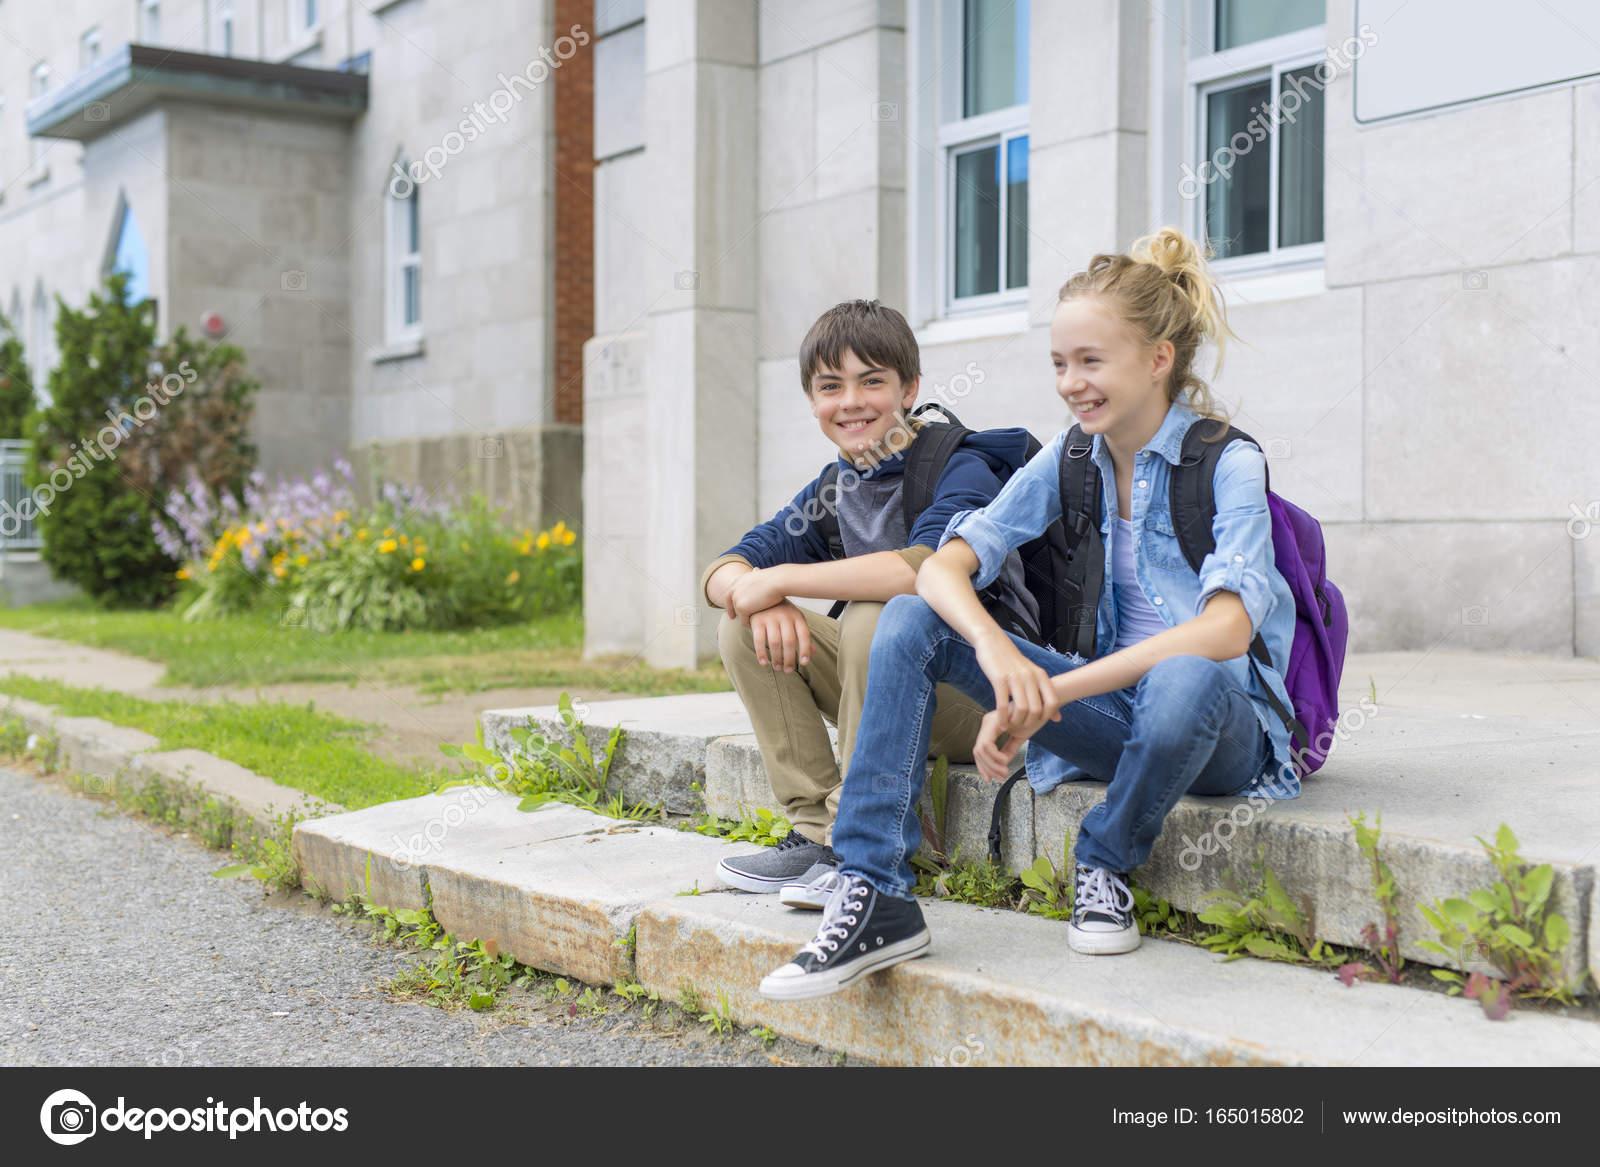 3c97284a1f4 Ένα πορτρέτο του σχολείου 10 ετών αγόρι και κορίτσι Διασκεδάζοντας έξω — Εικόνα  από Lopolo